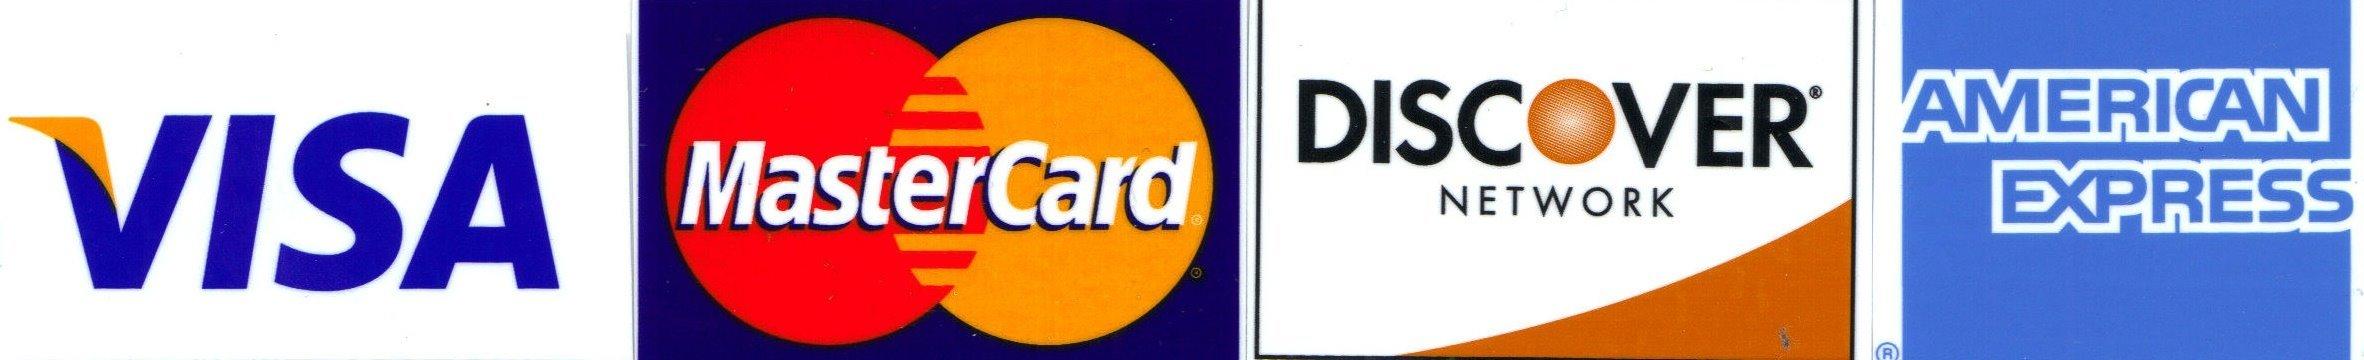 creditcardlogoshorizontal.jpg